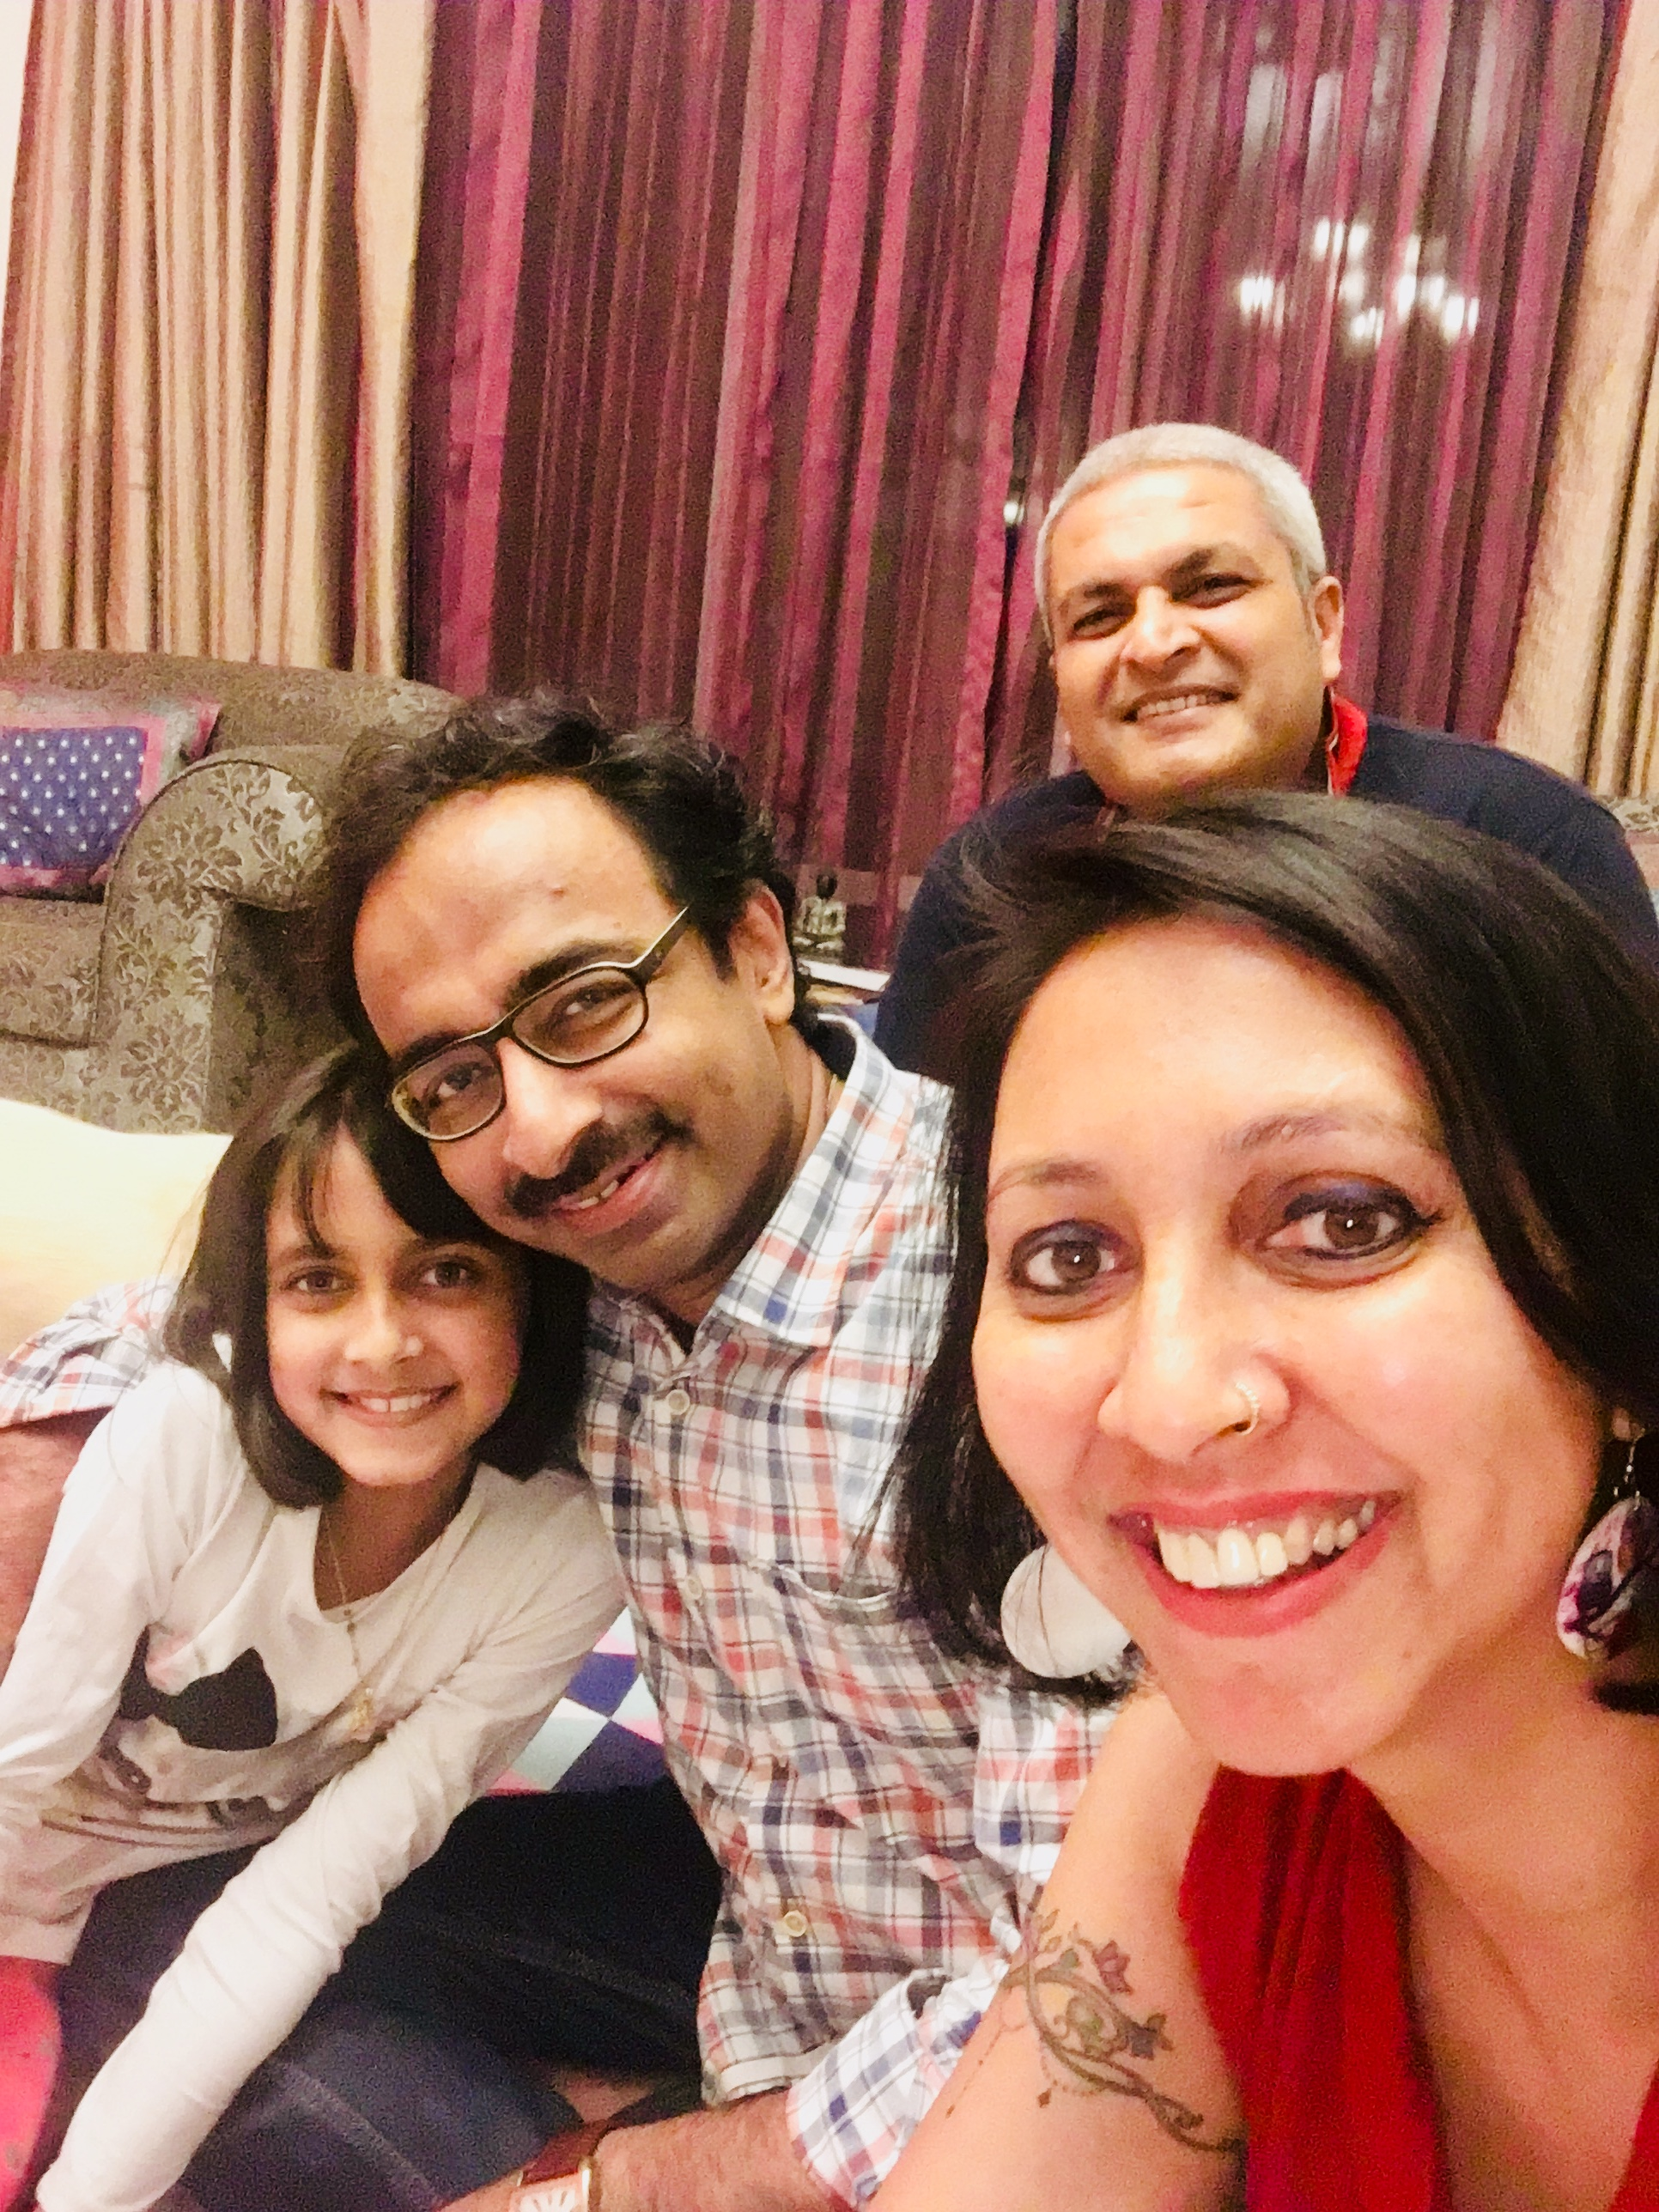 a-to-z-challenge-2018-april-anecdotes-natasha-musing-U-uplifting-our-energy-family